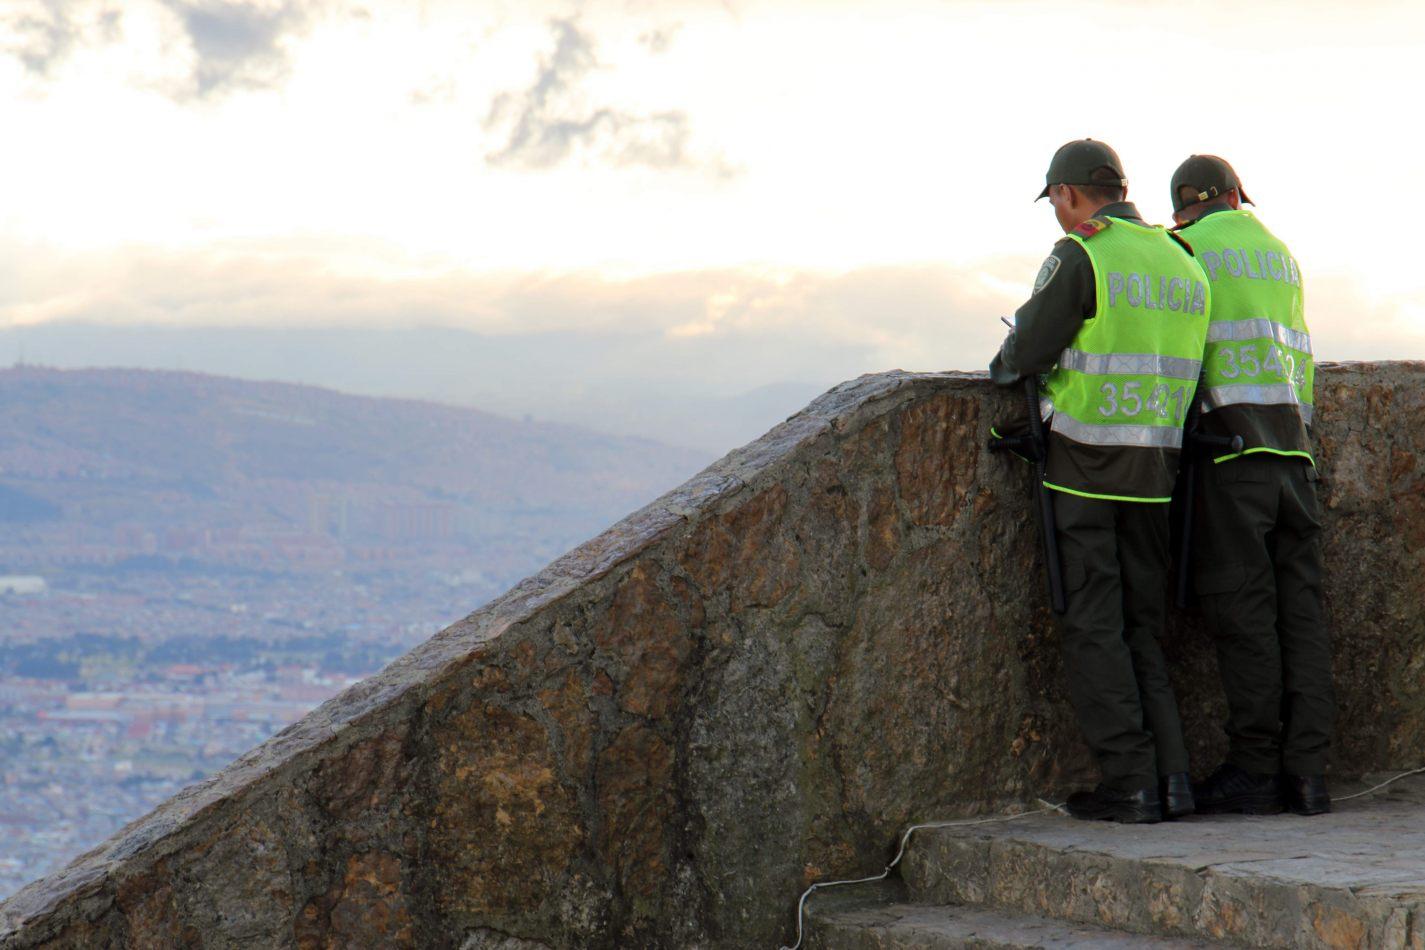 Anthony Ellis Photography: Antes del Refer� ndum - Mountain Police